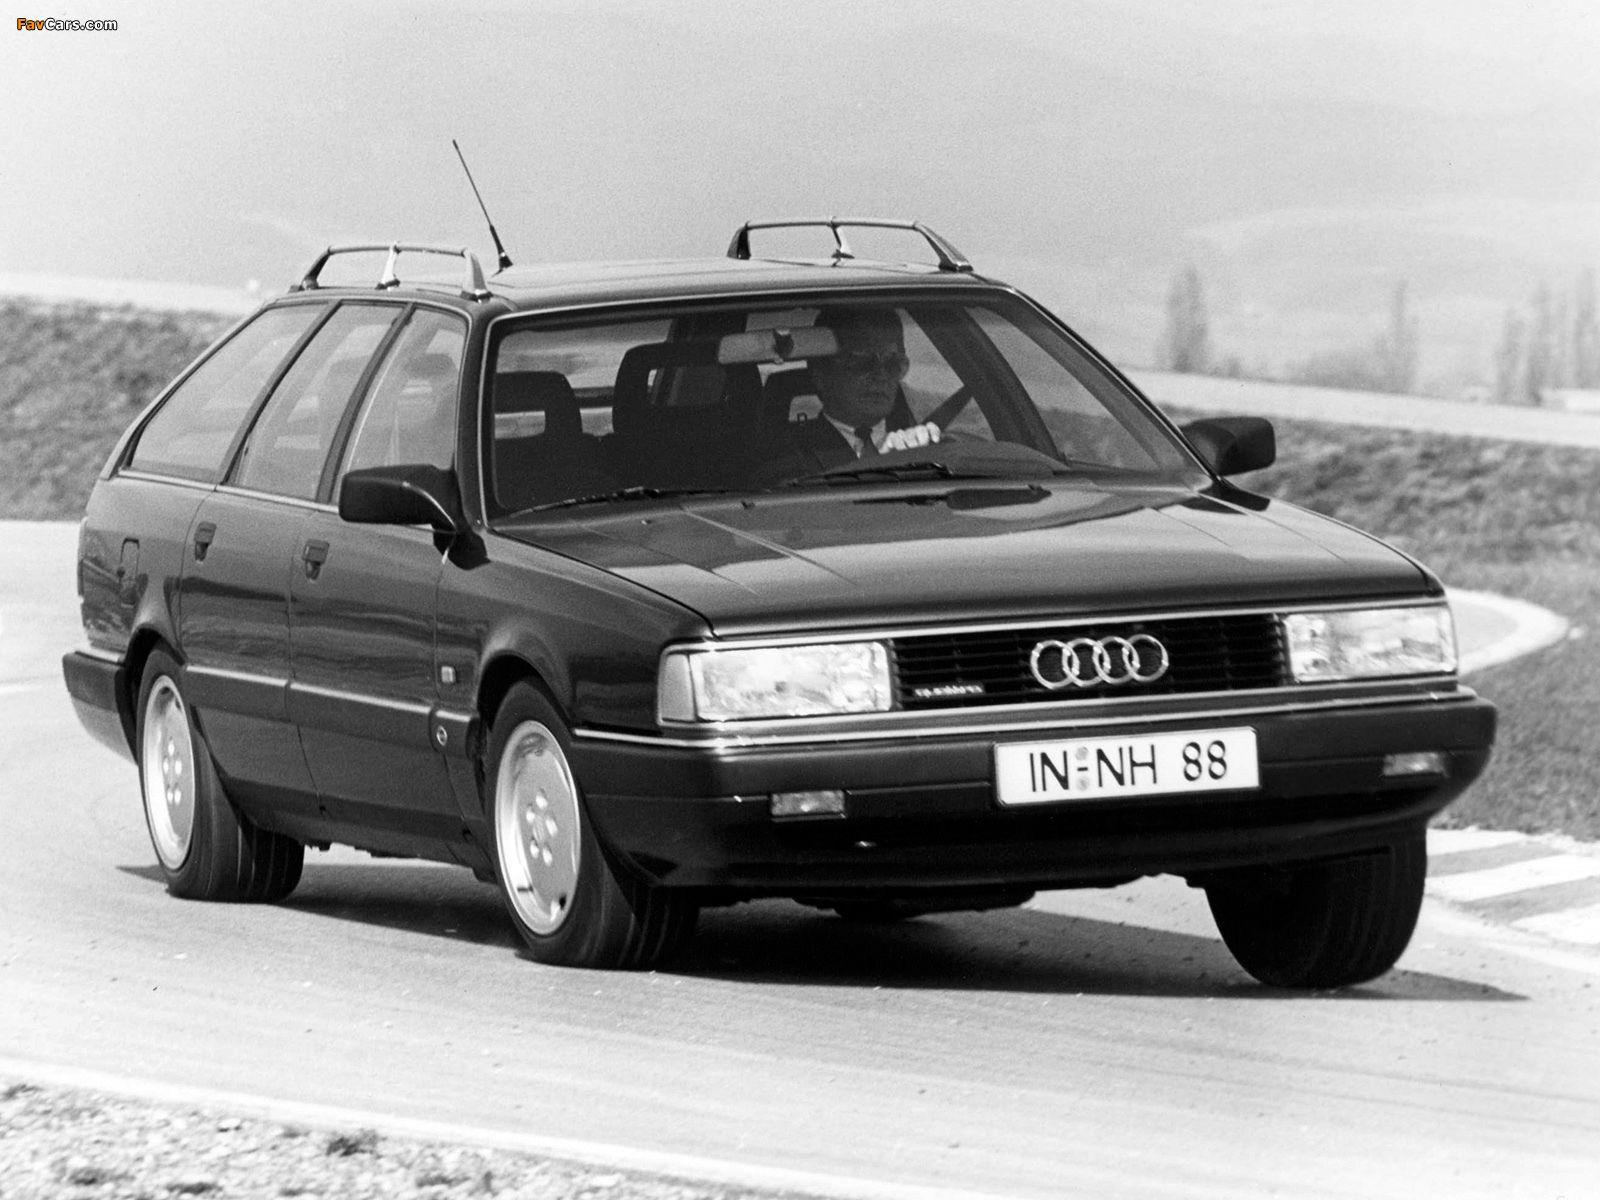 1990 Audi 200 Turbo Quattro Specs, Colors, 0-60, 0-100, Quarter Mile Drag and Top Speed Review ...